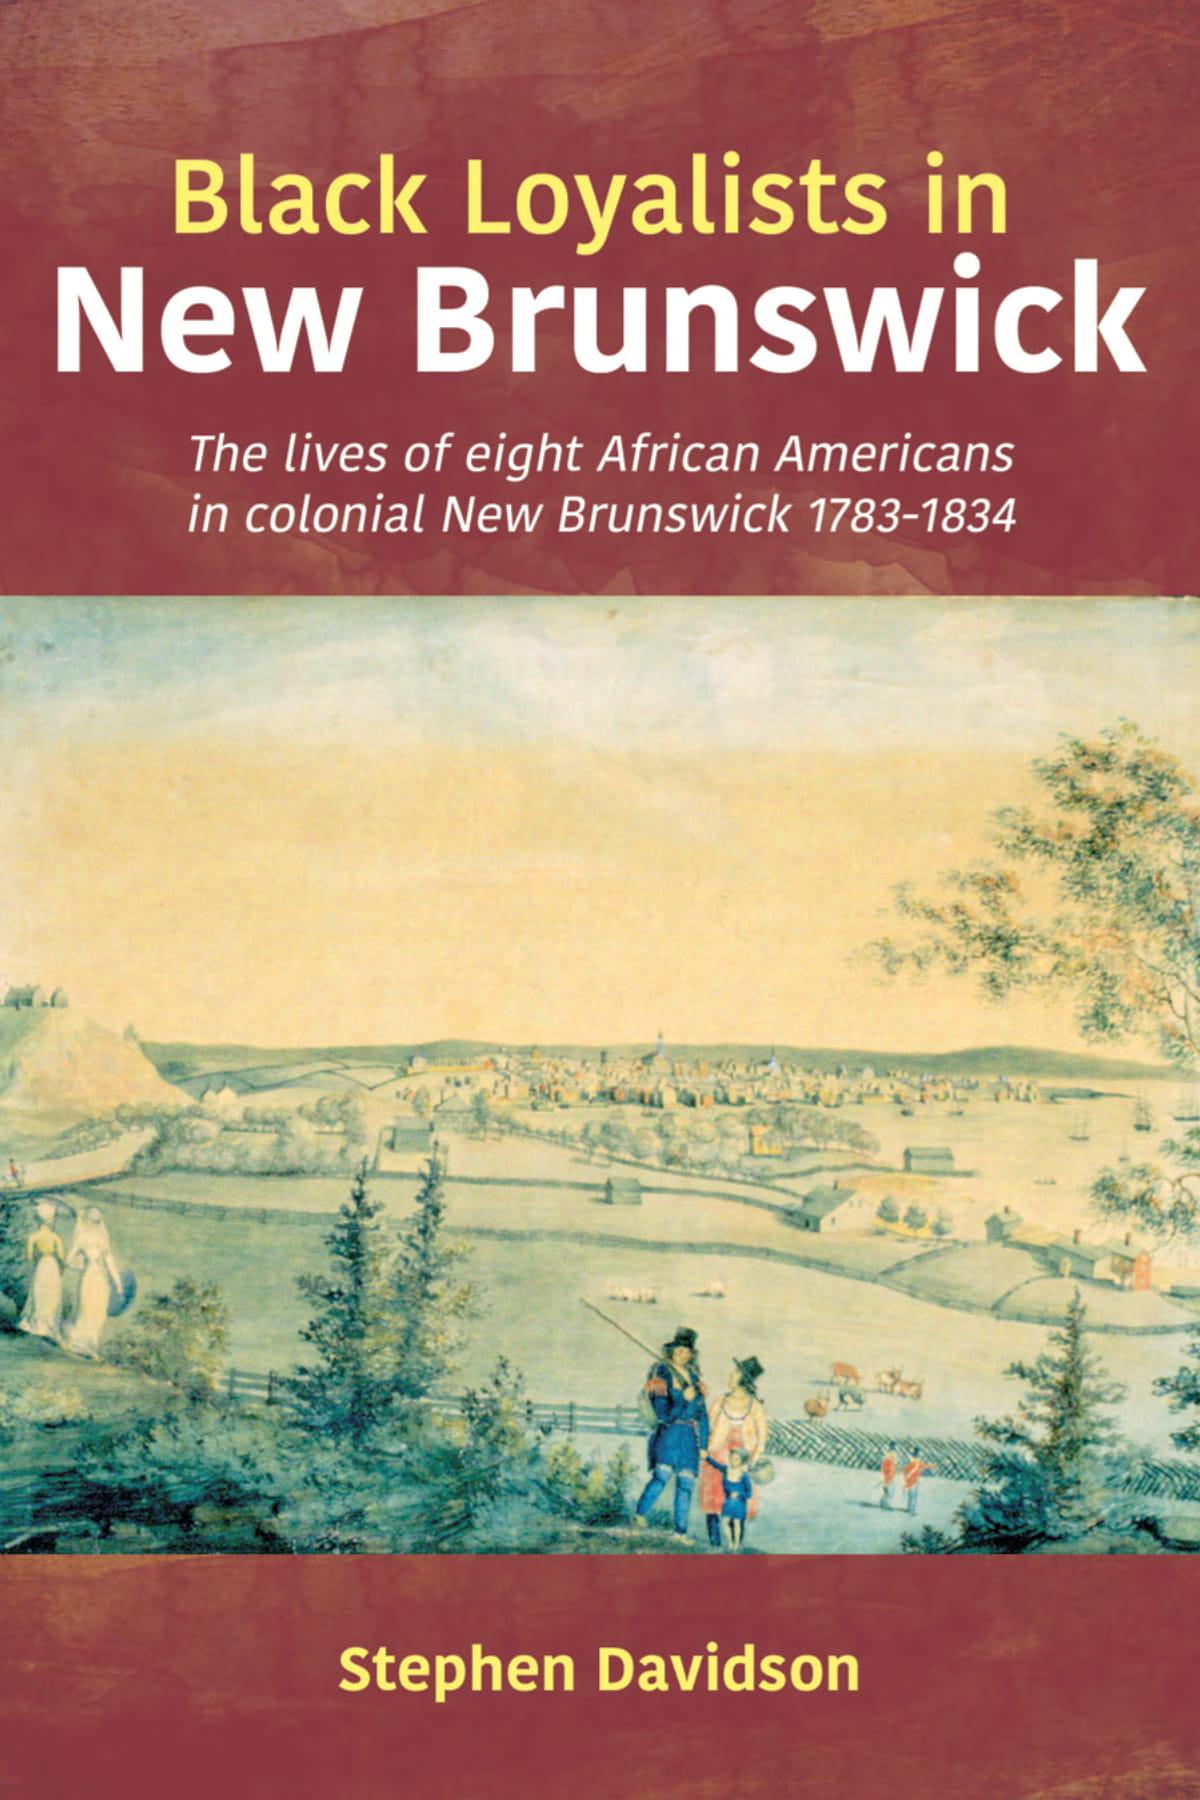 Black Loyalists in New Brunswick